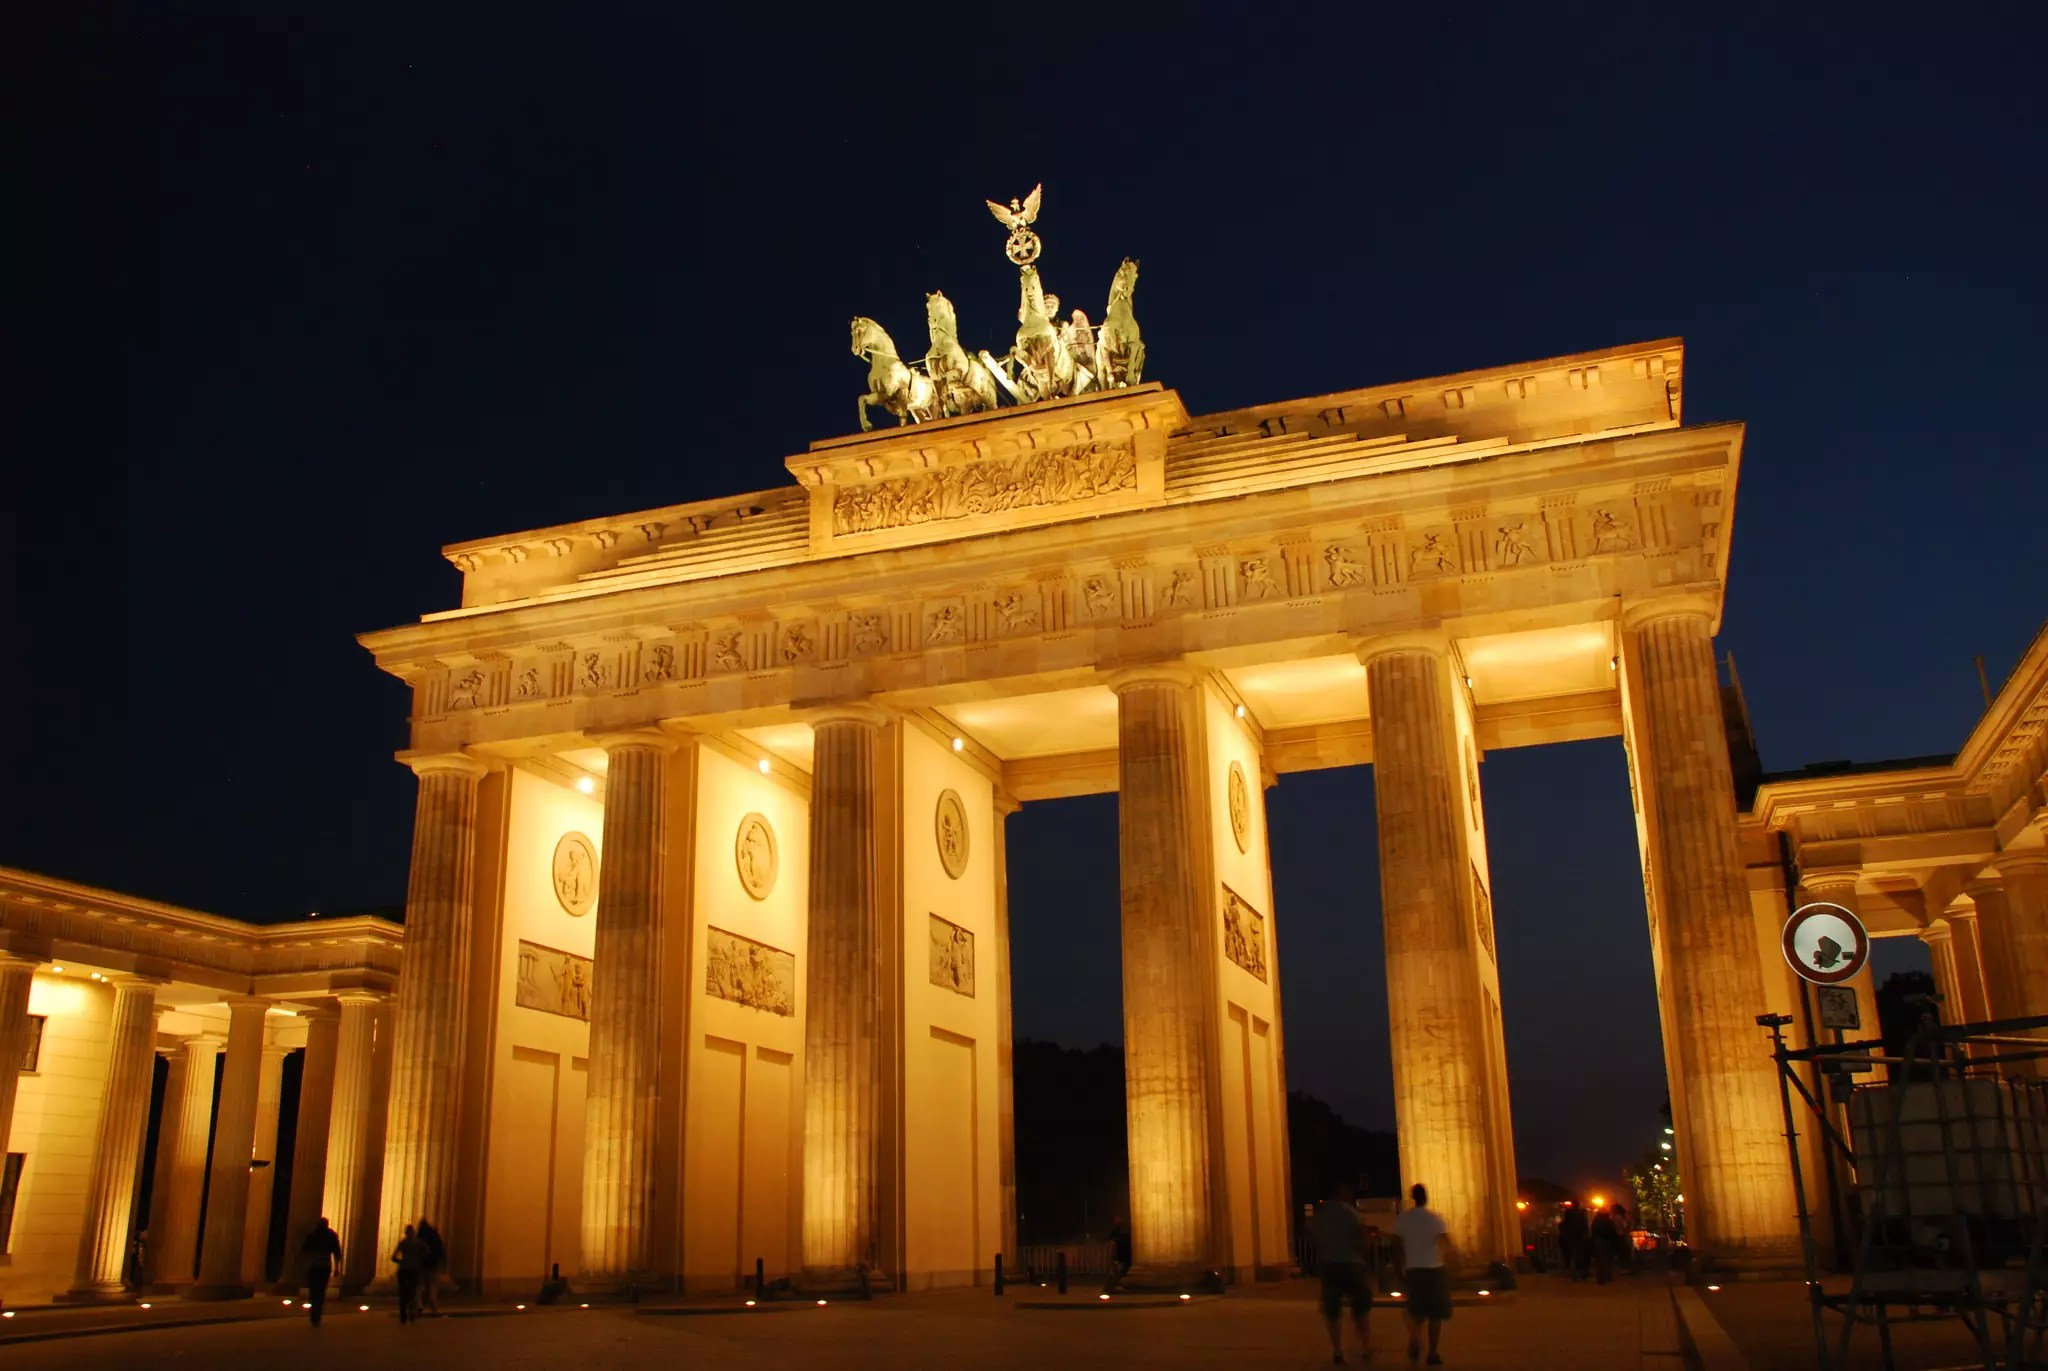 The Brandenburg Gate, Berlin, Germany - photo by www.traveljunction.com under CC BY-SA 2.0